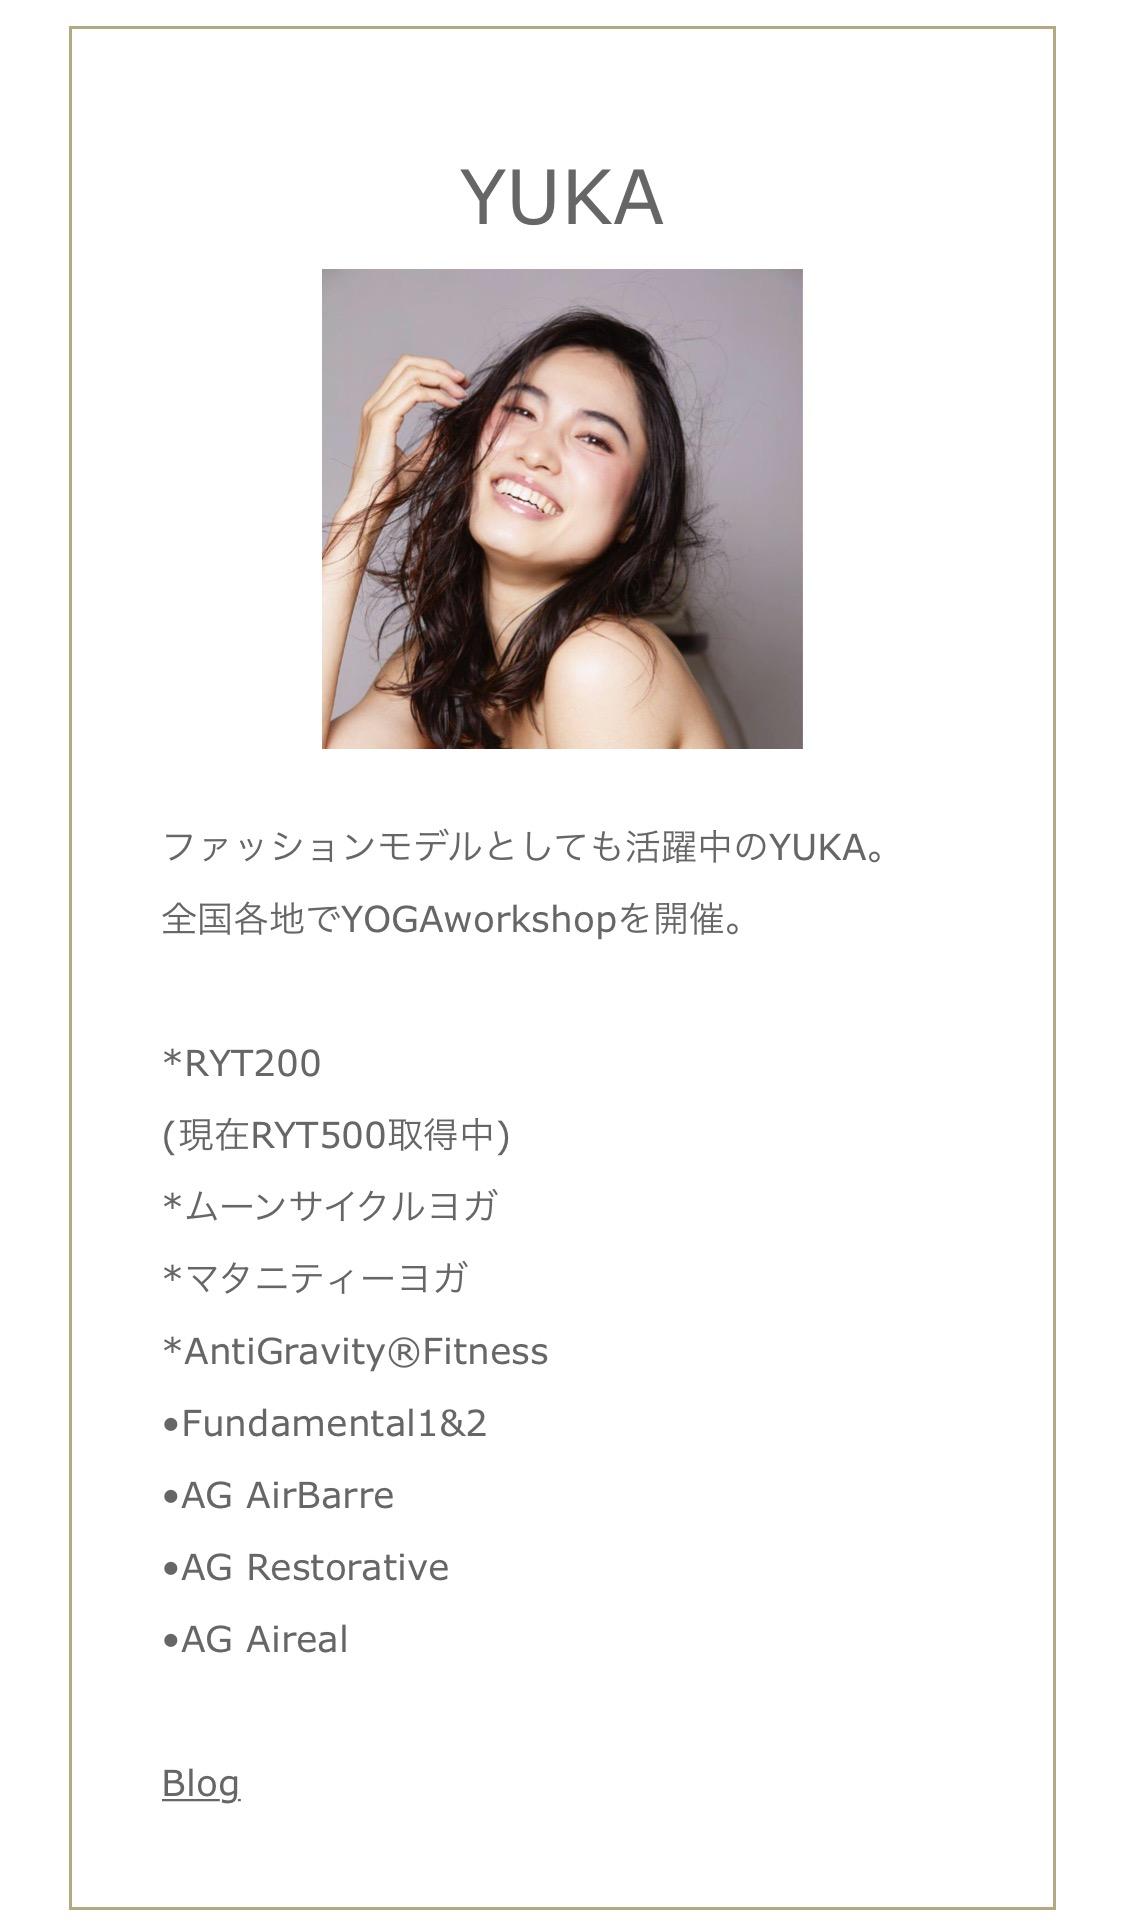 9/23[Mon]  祝日特別WORKSHOP